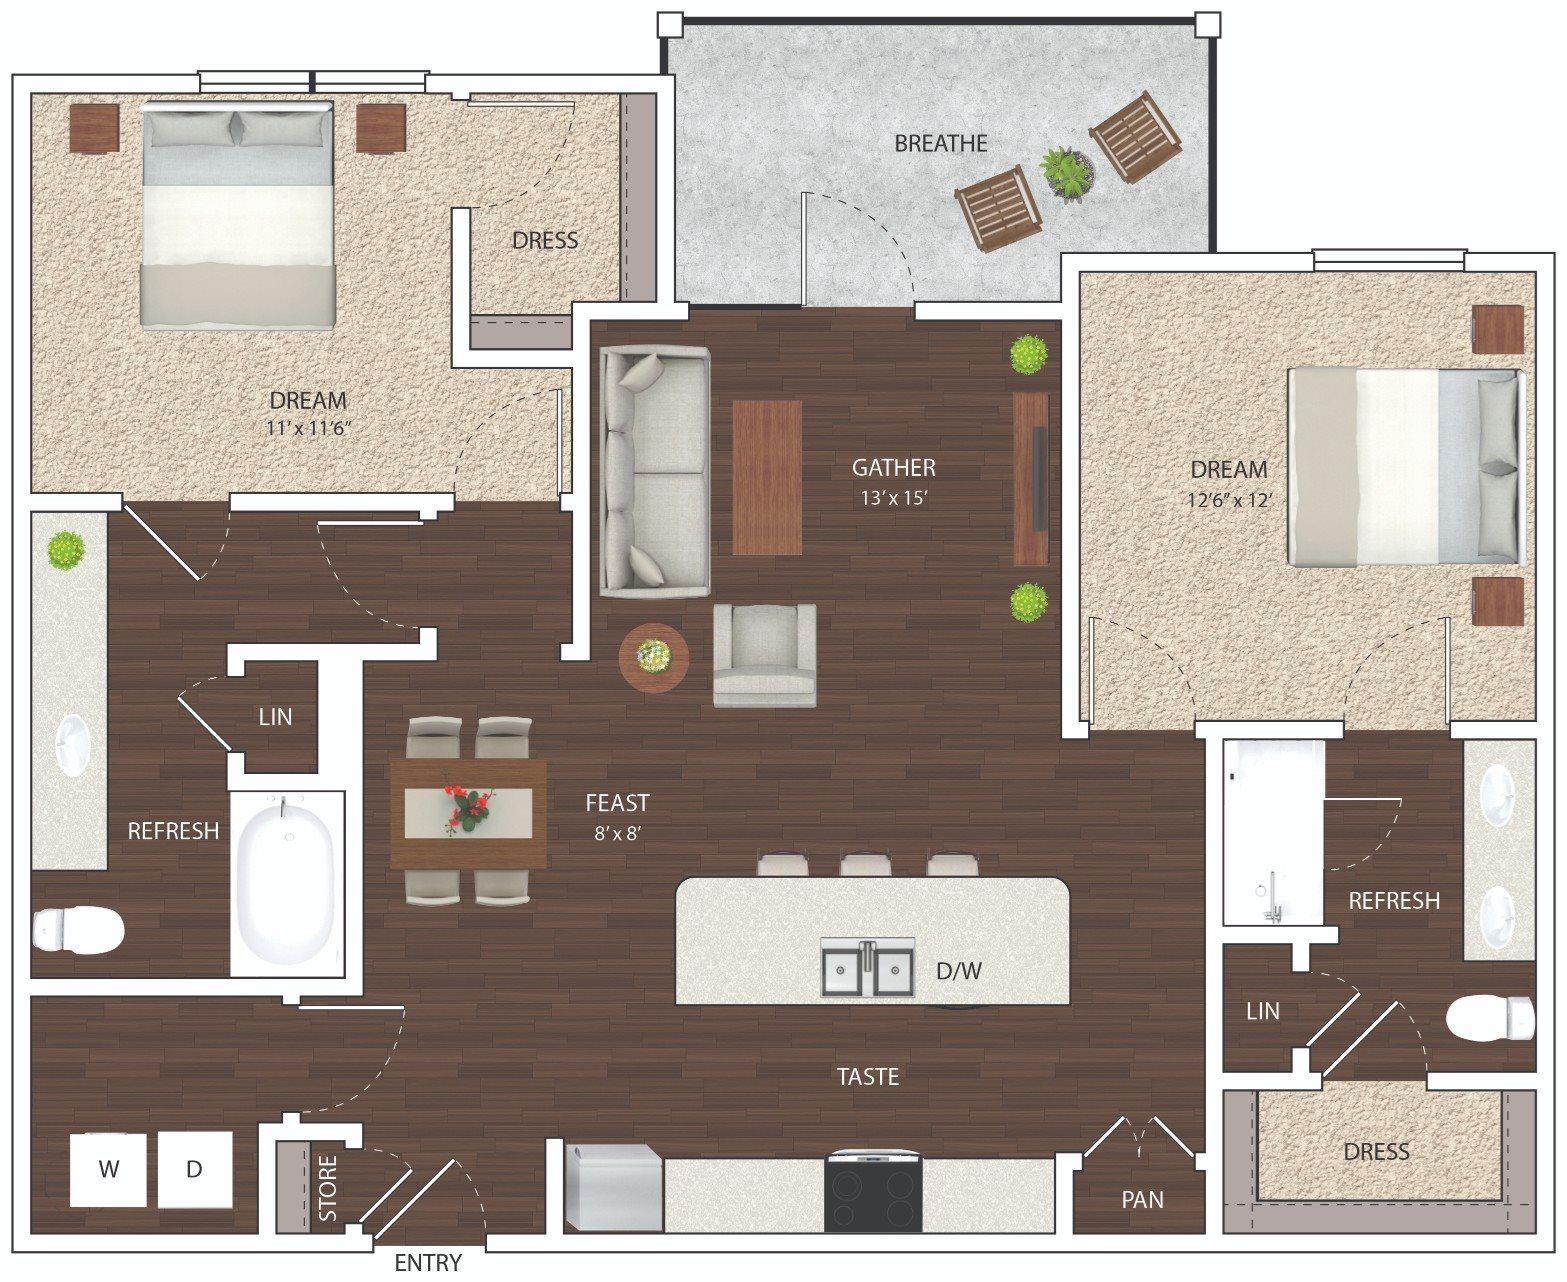 B2 - Phase I Floor Plan 9